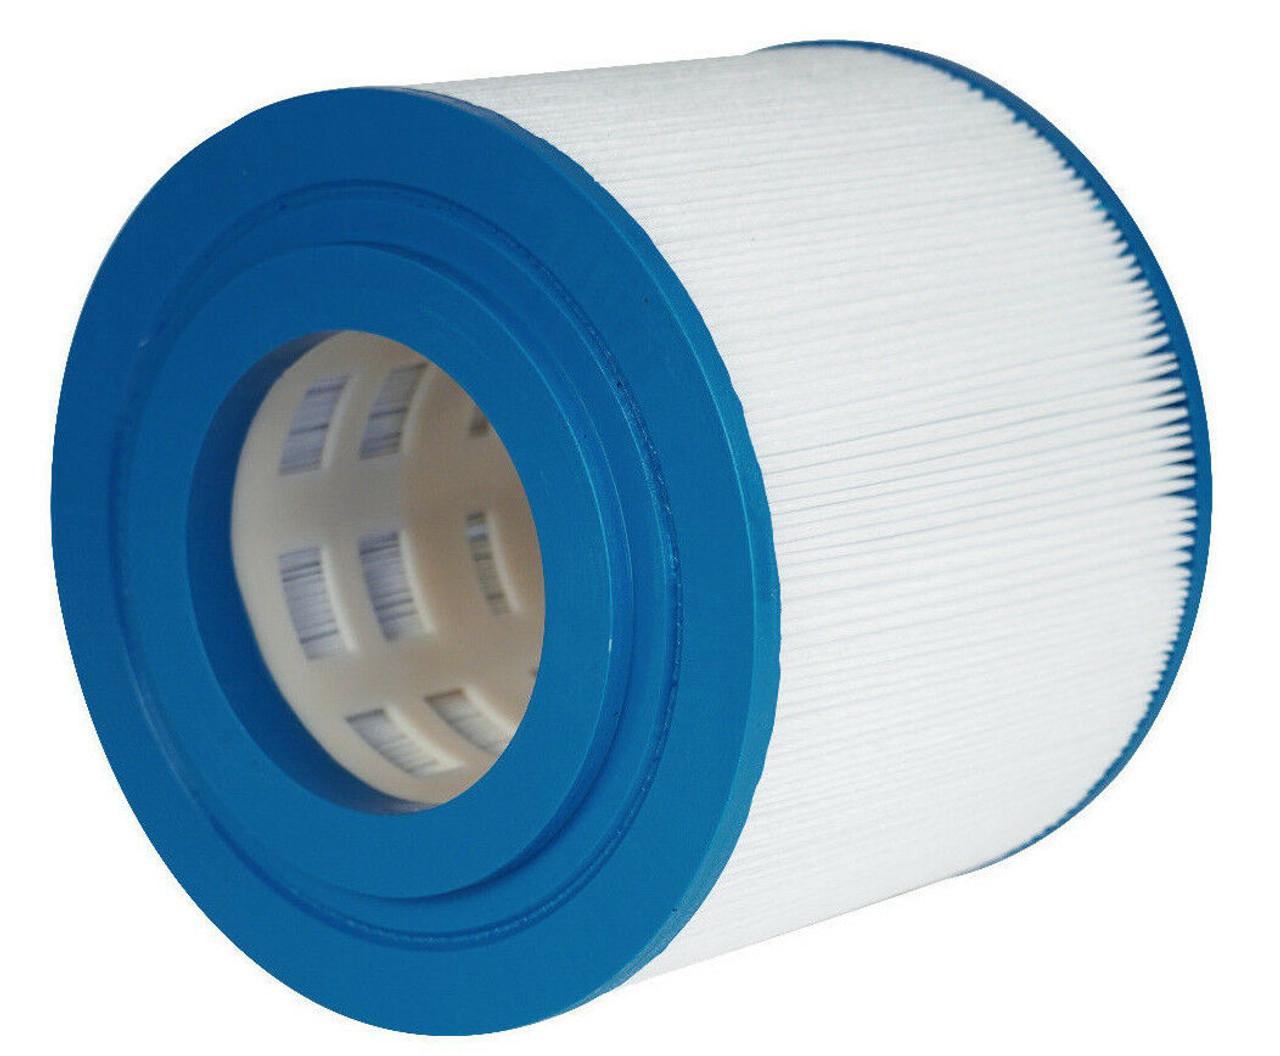 NLA - Legend Series®-Down East Spas-Legacy Whirlpool®-Eco Pur Mineral Filter Set-X268552-PMA45-2004R-X268056-PMA-EP1